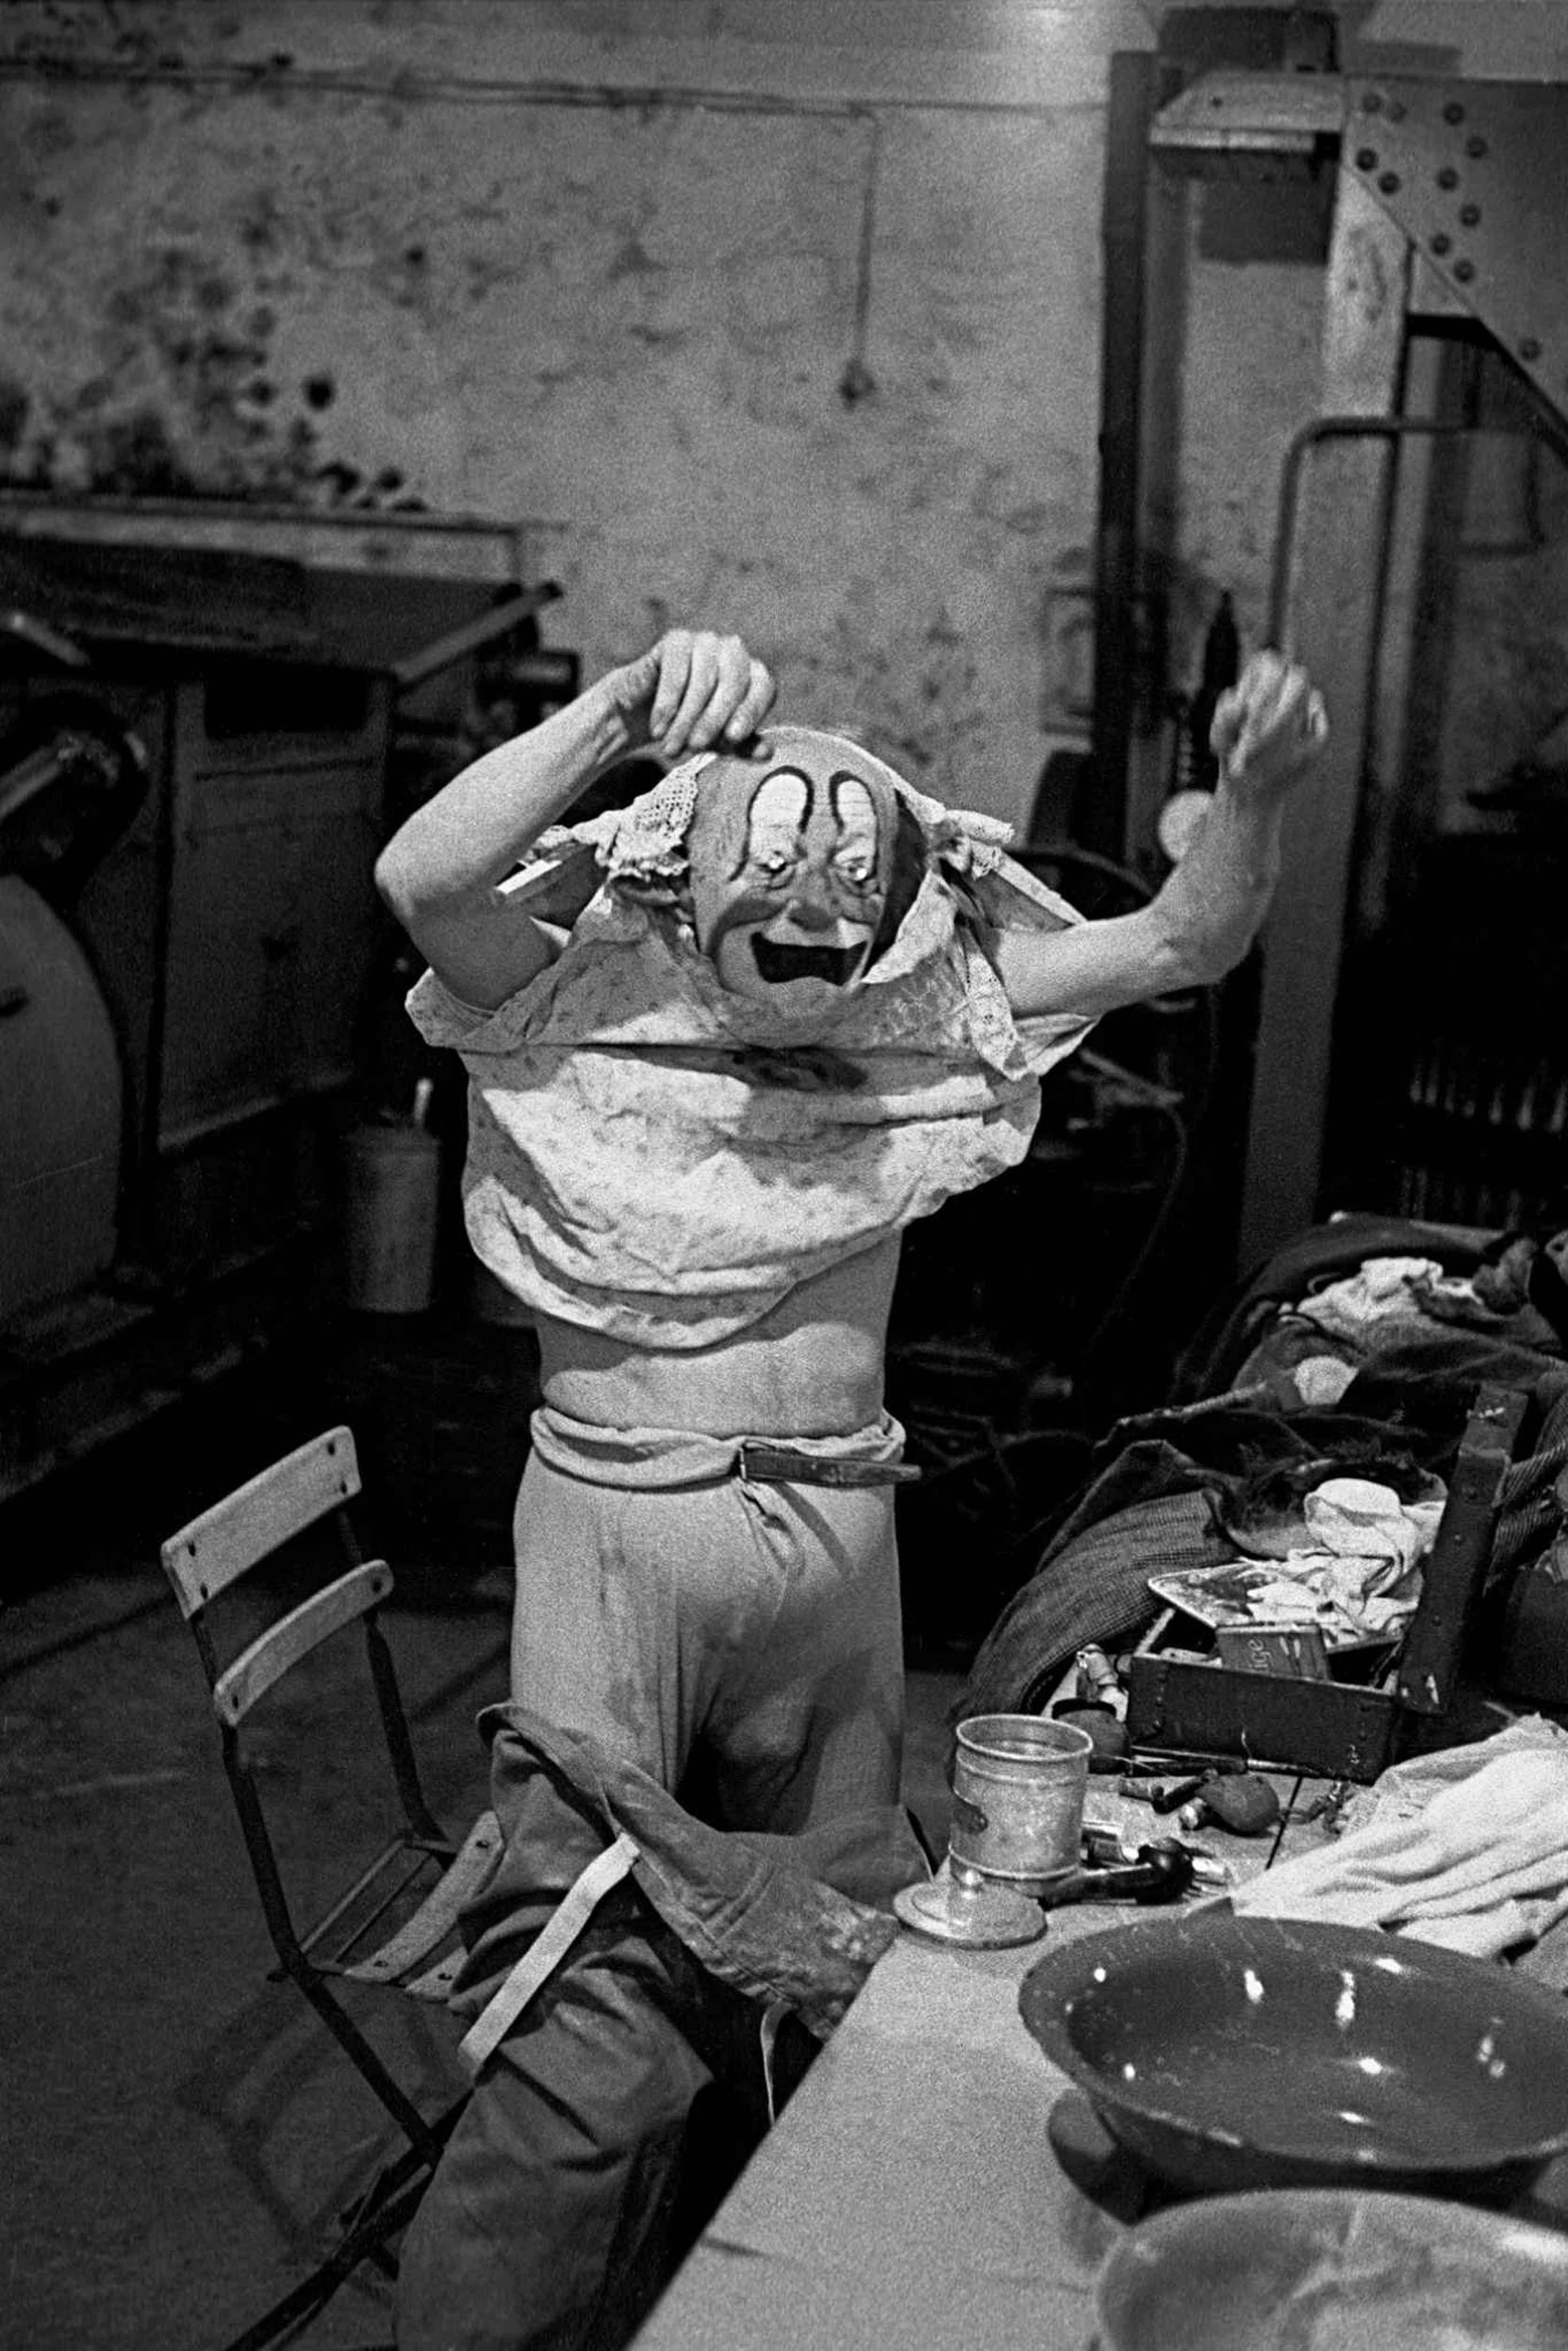 Frank Horvat, Alberto Fratellini, Clown (1959). 35x25 cm